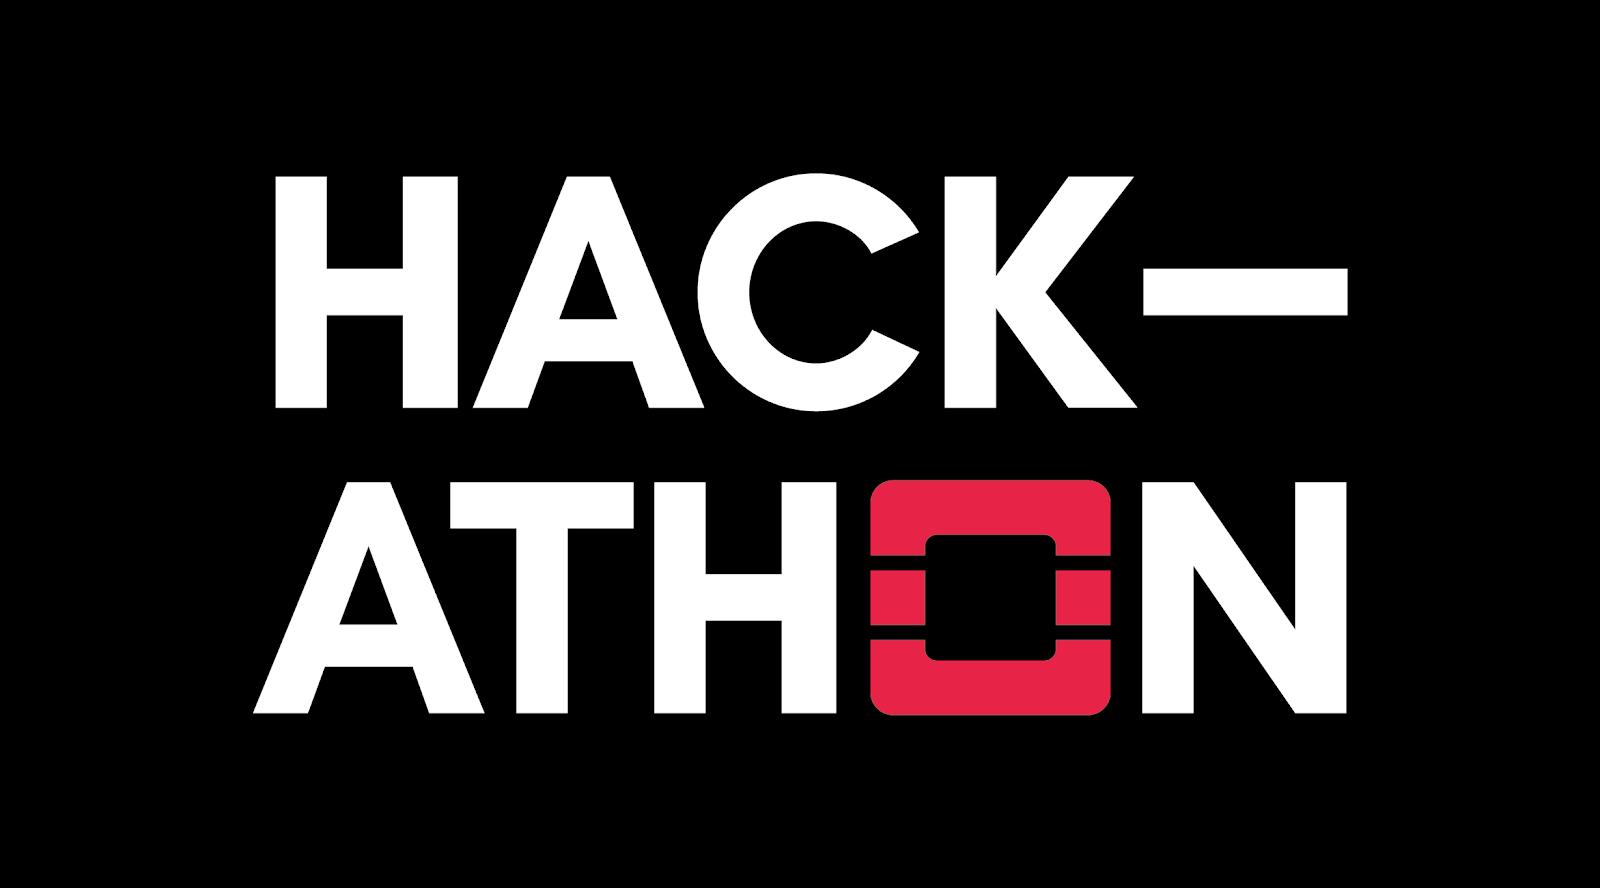 hackathon-logo.png